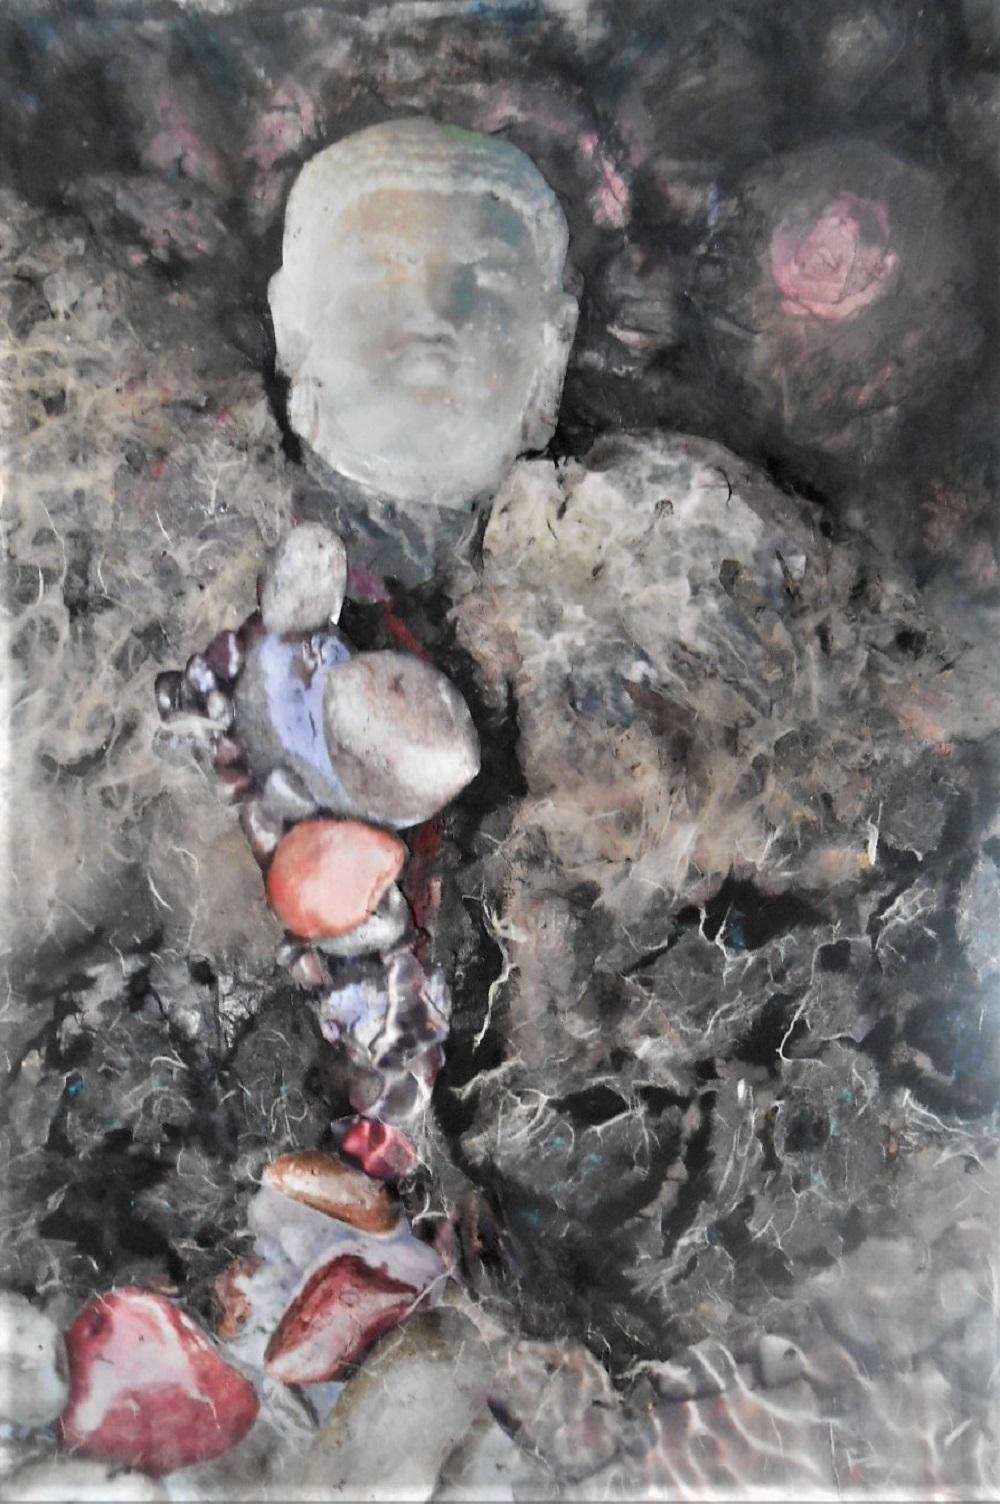 abramson, gertrude, buddha head, mixed media,18x26inches